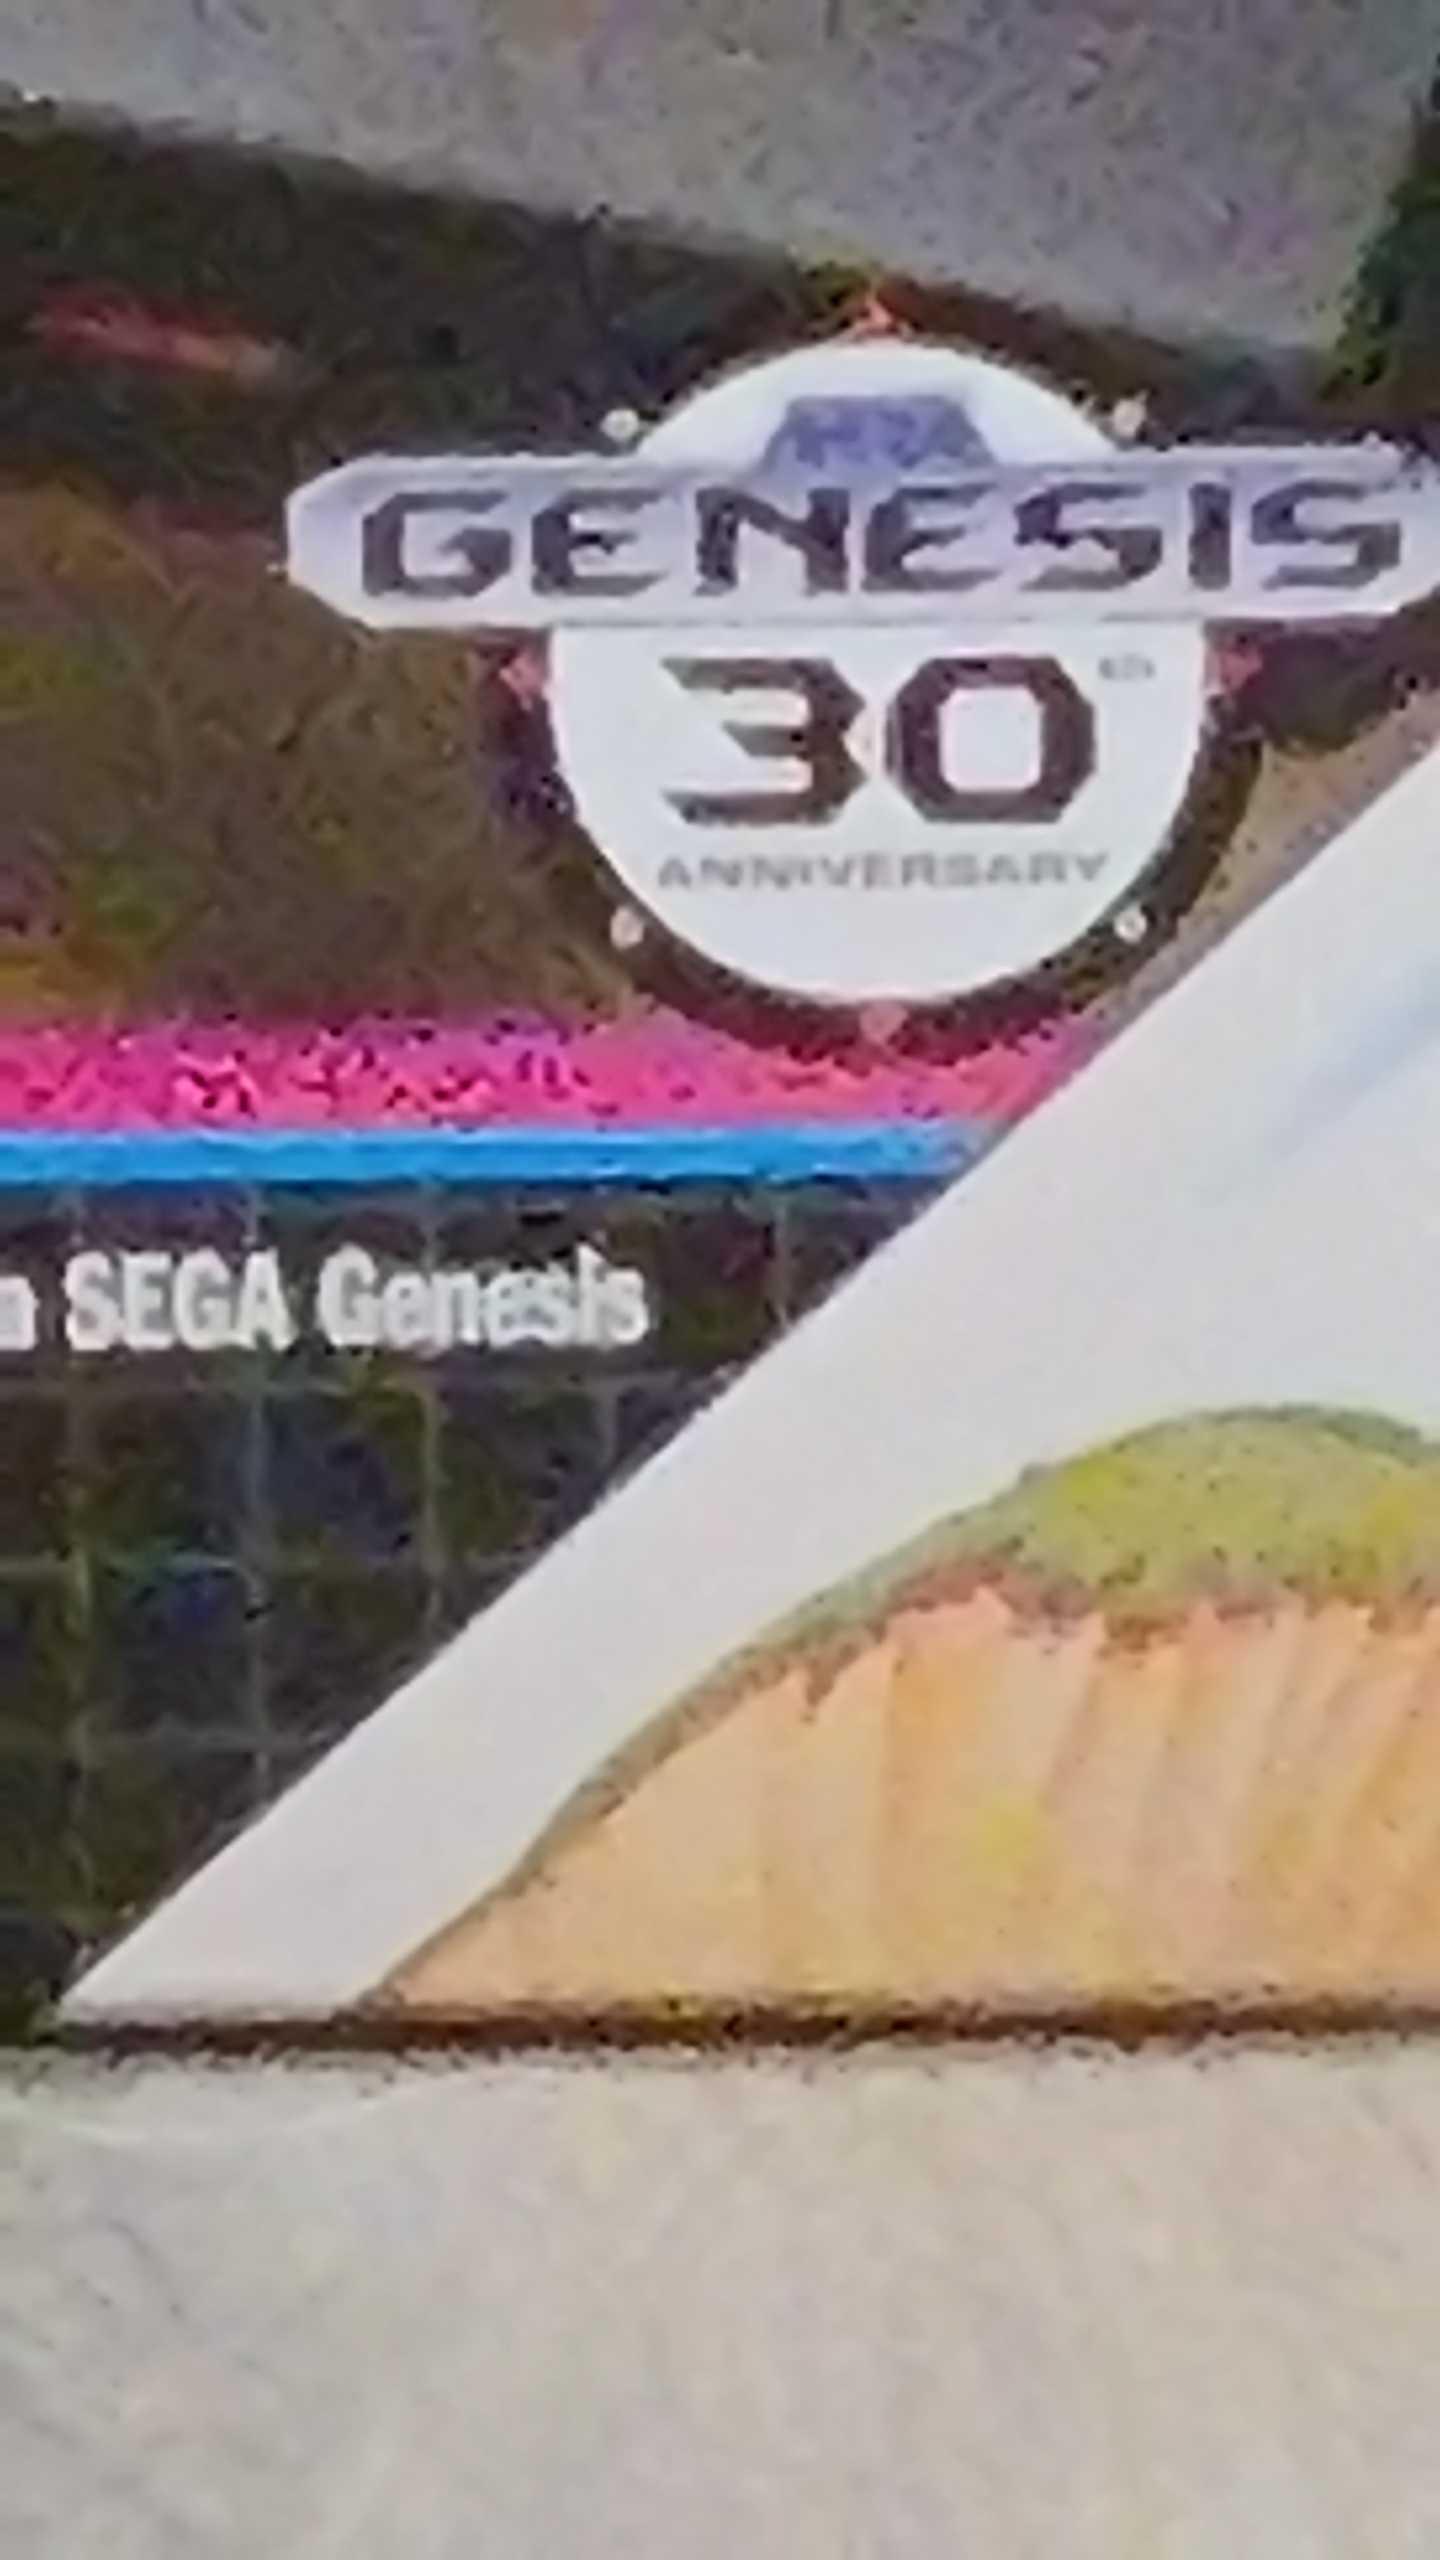 Samsung GALAXY S20 Plus poza 30x